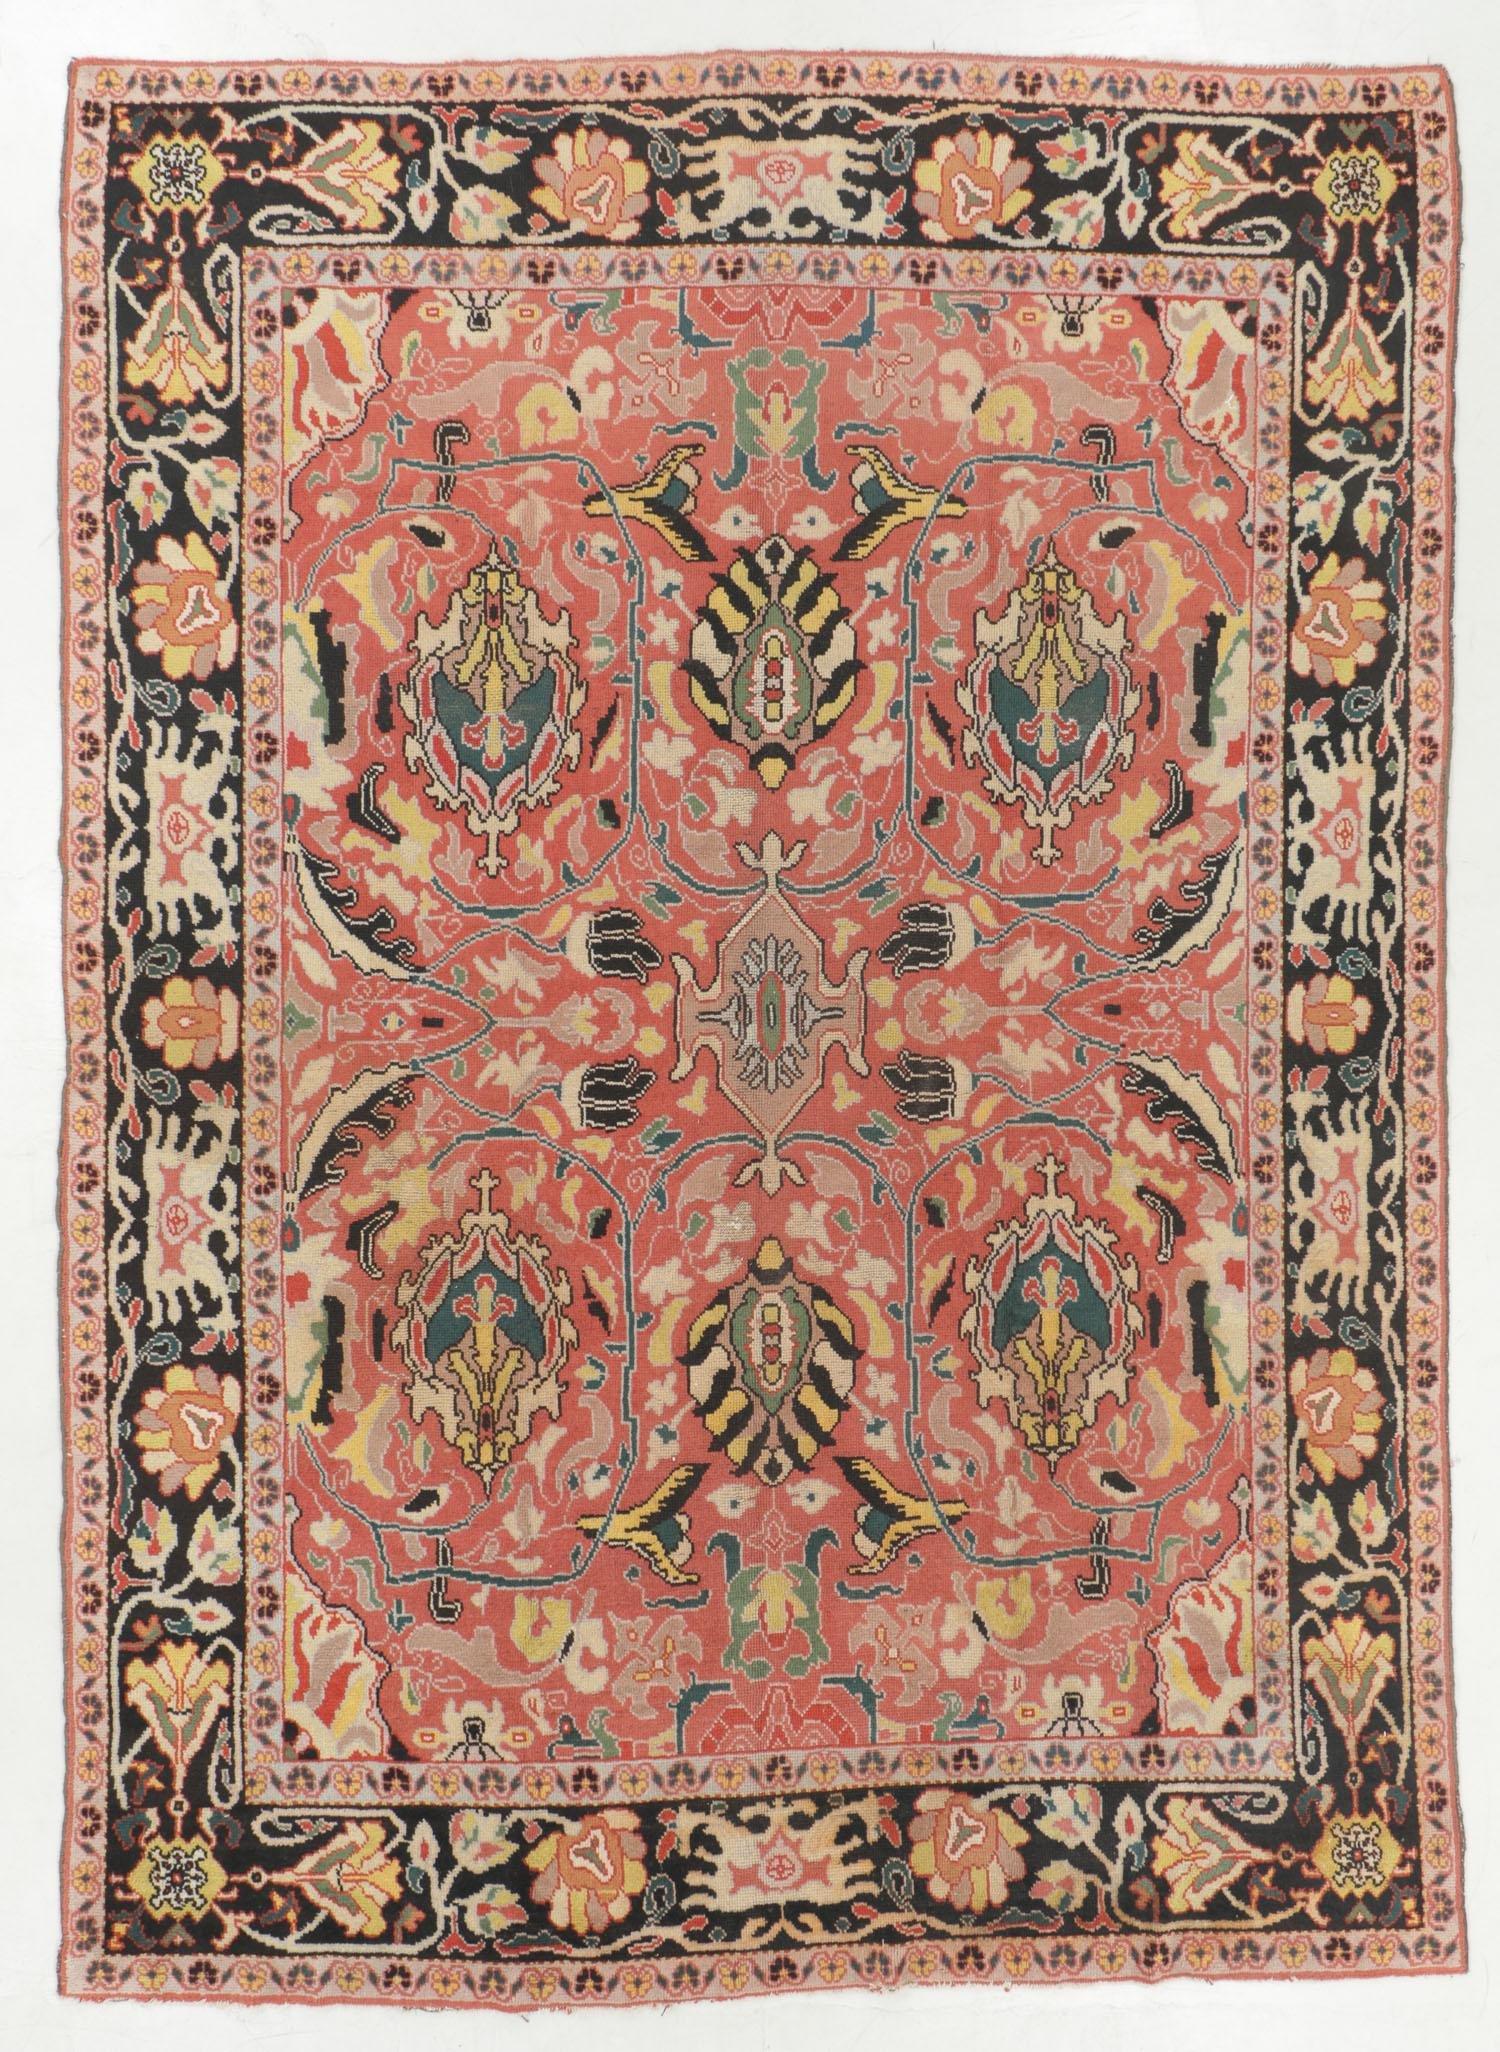 Antique Arts & Crafts Rug, Eastern Europe: 8'6'' x